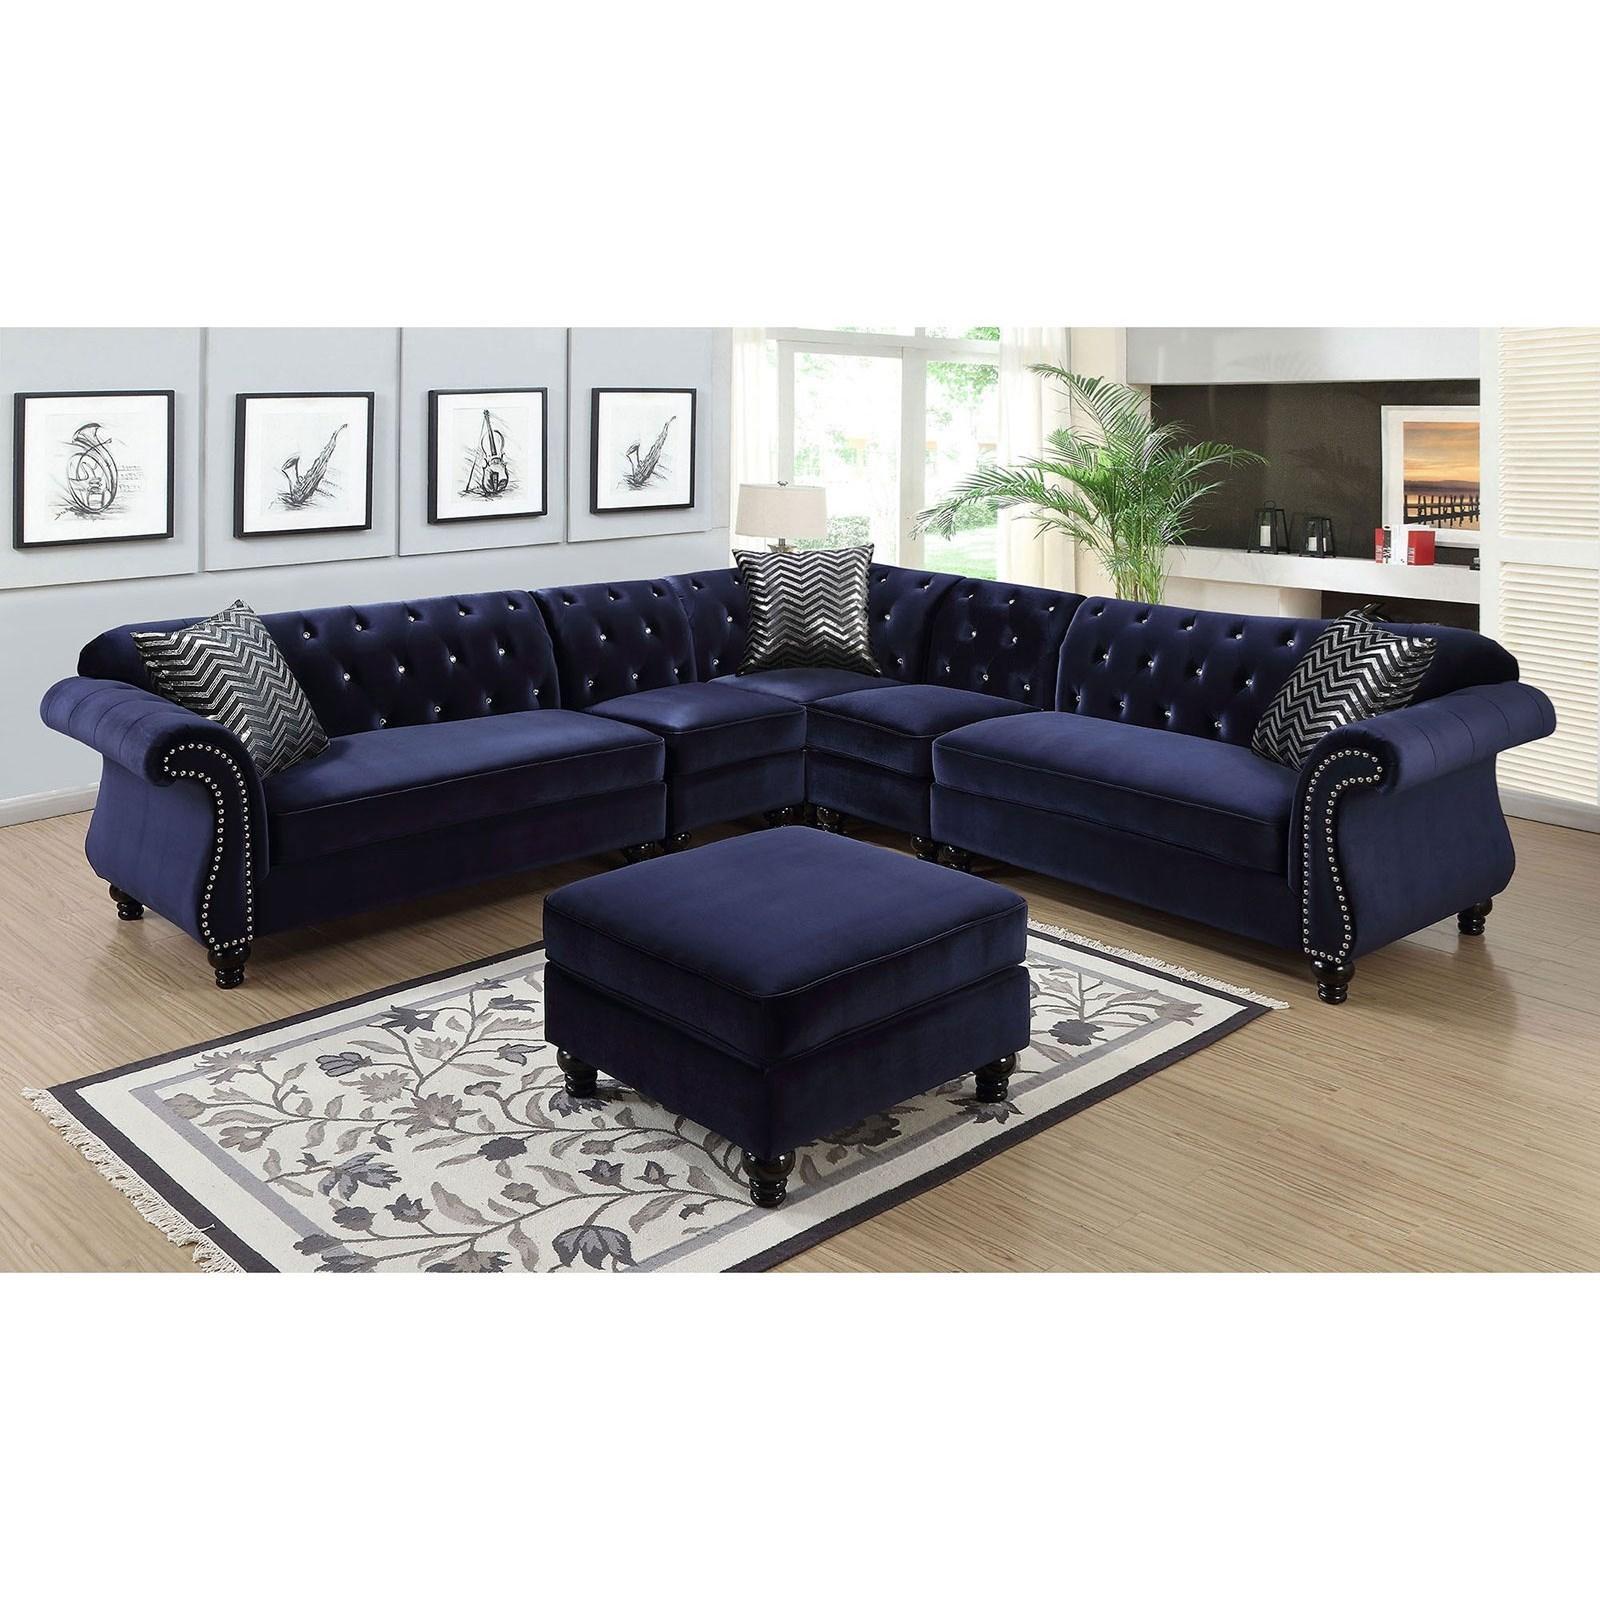 Jolanda II Sectional by Furniture of America at Nassau Furniture and Mattress